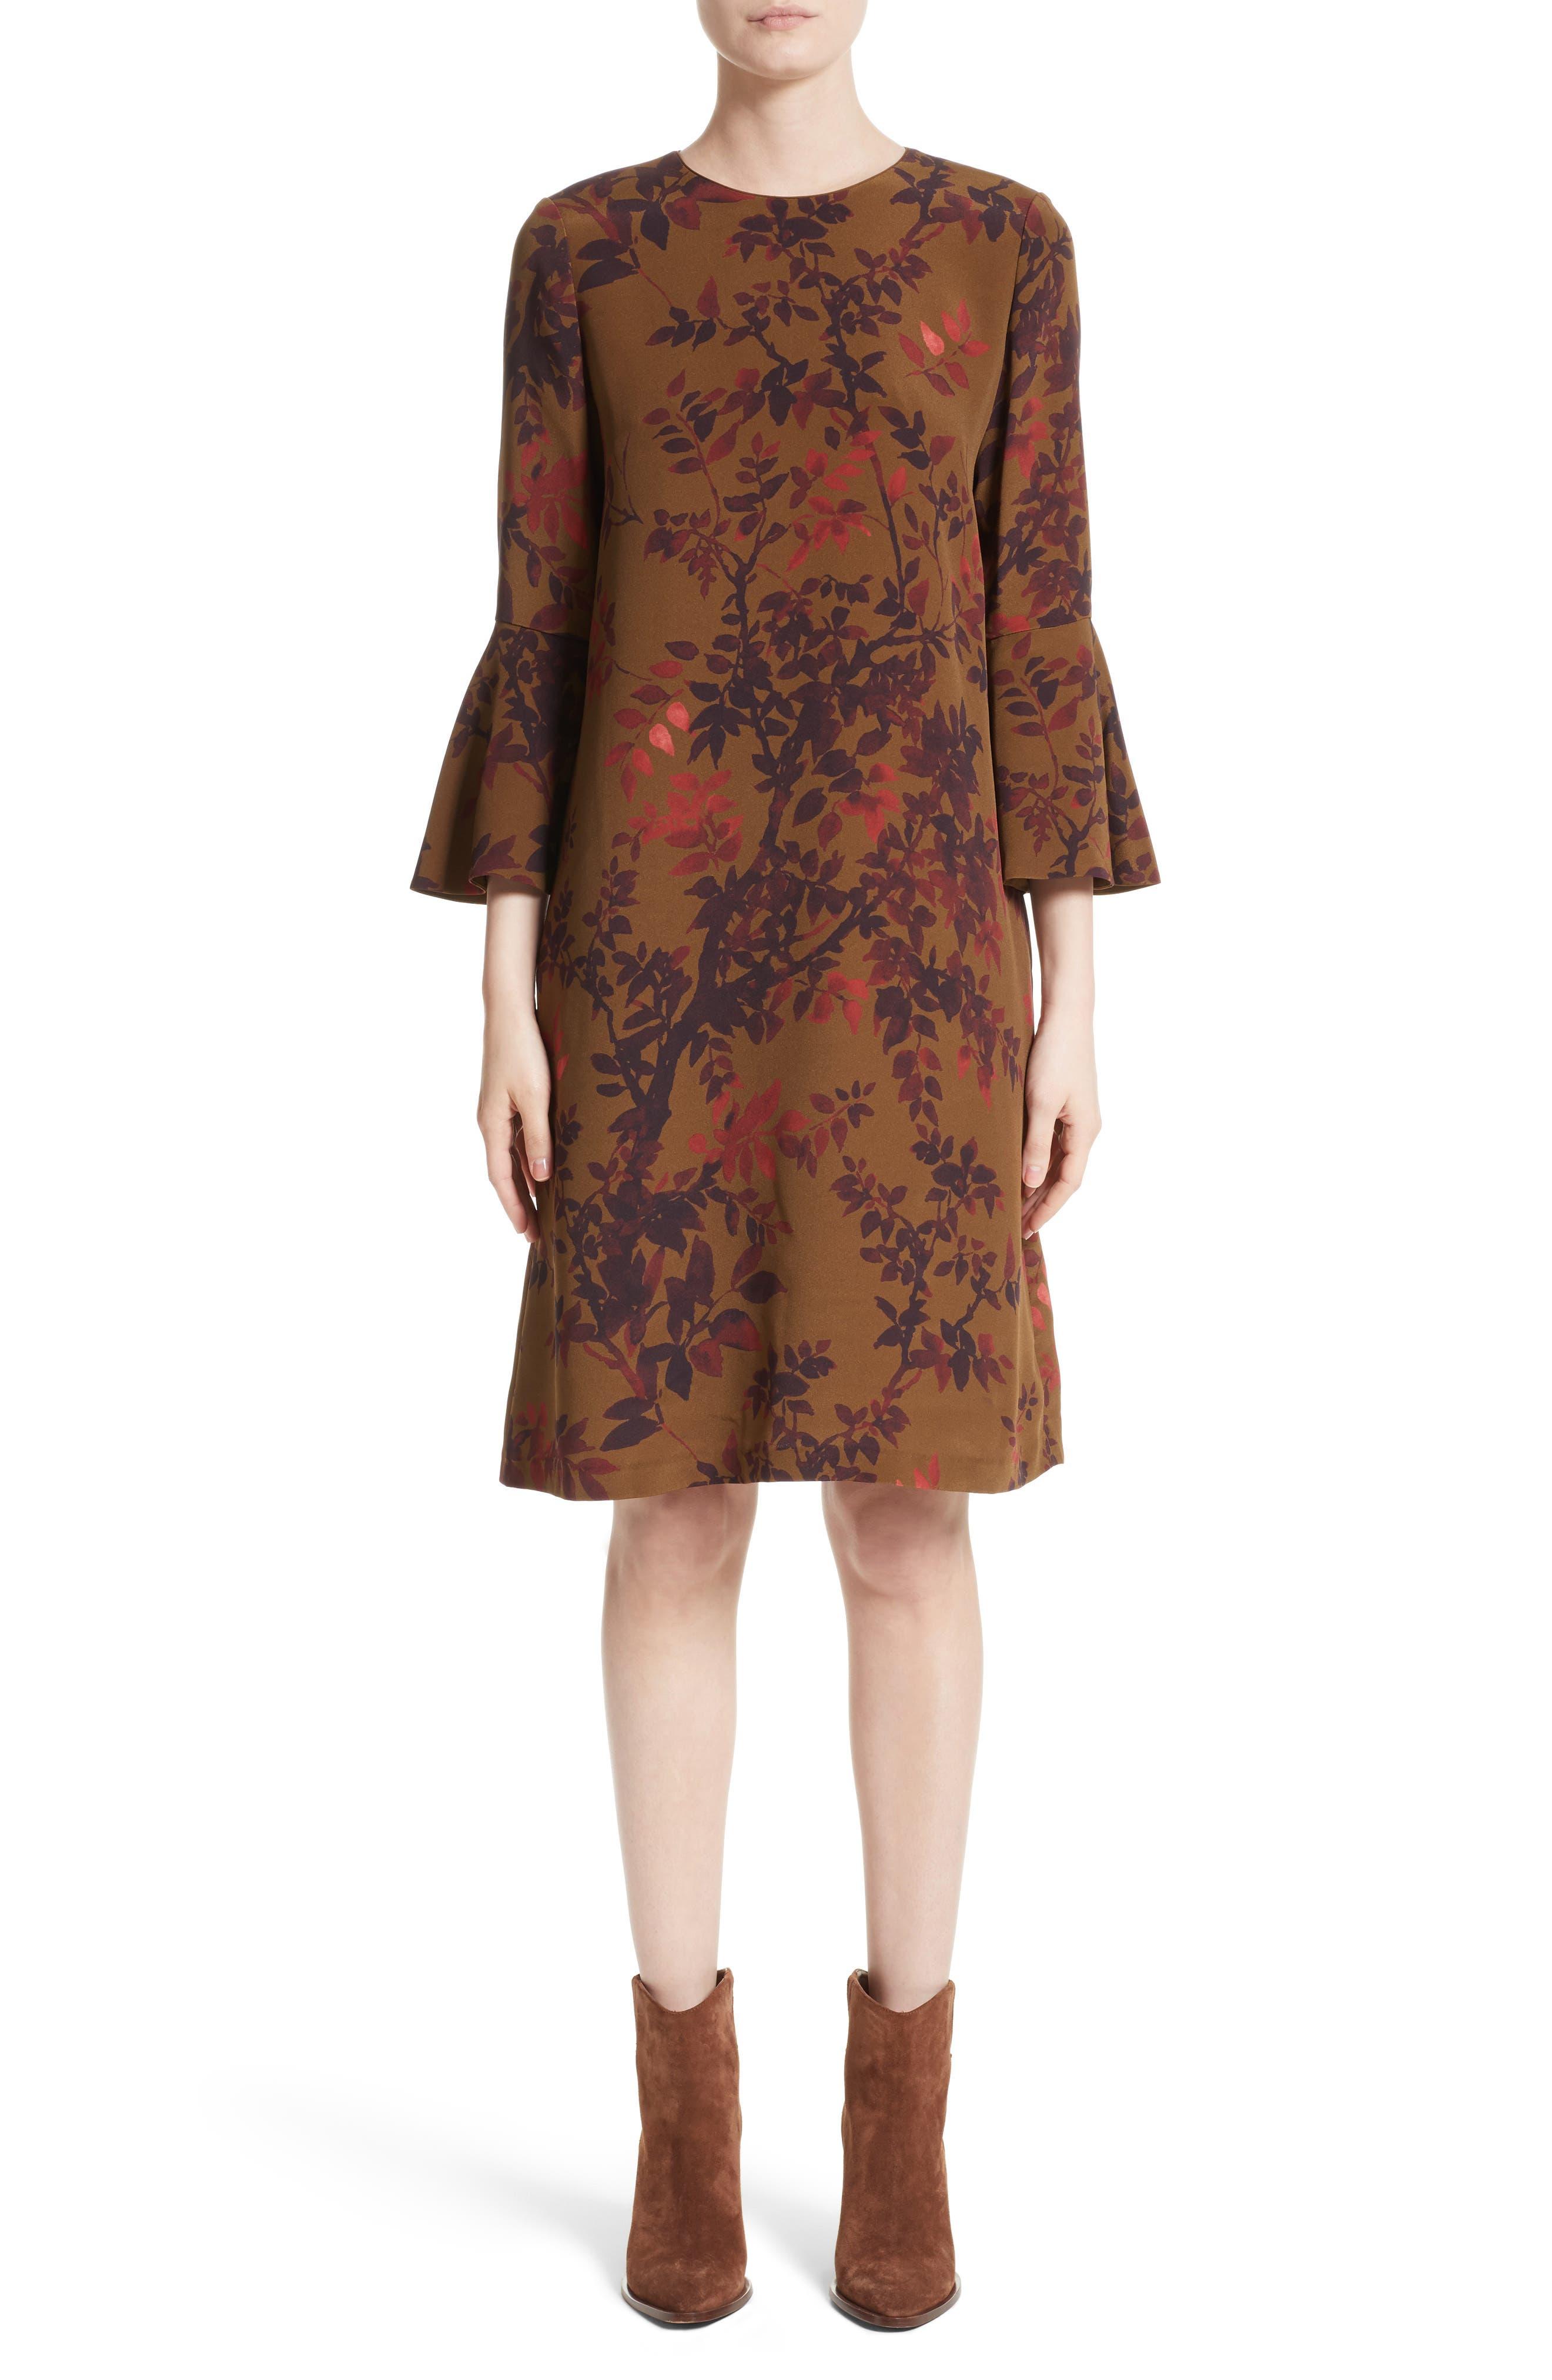 Alternate Image 1 Selected - Lafayette 148 New York Sidra Floral Print Silk Dress